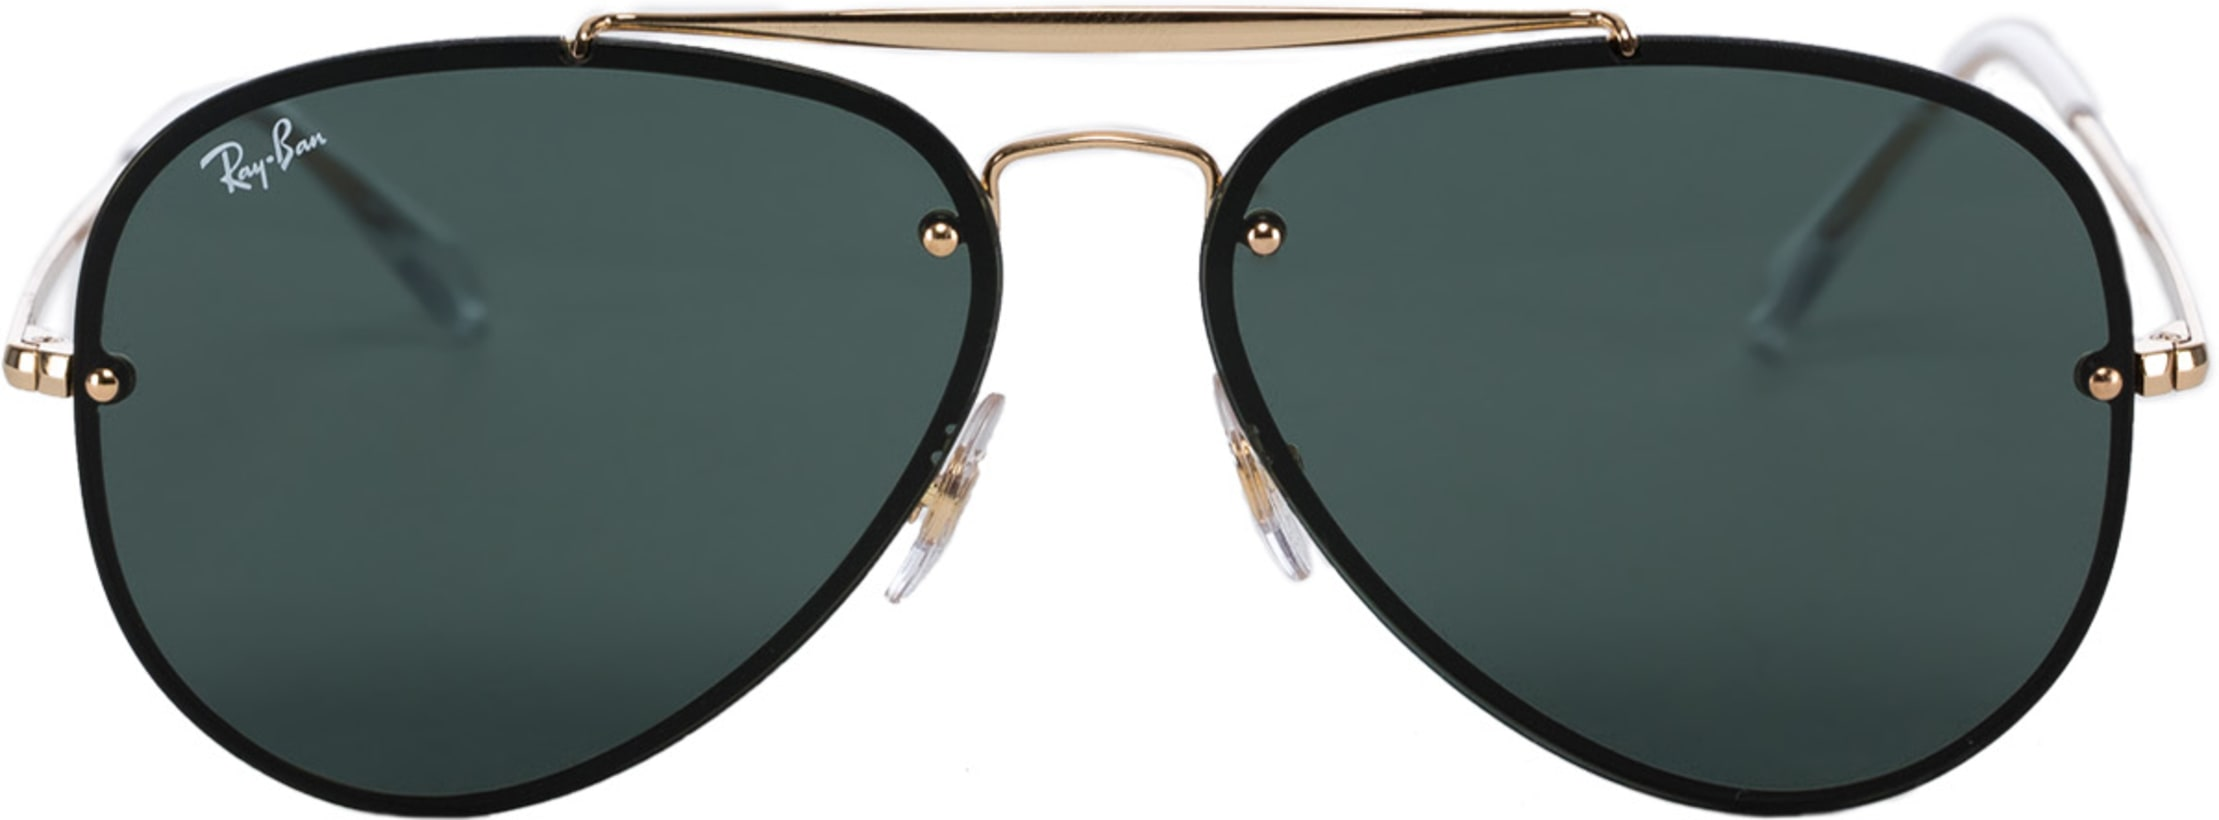 e61cee6913cd5 Ray-Ban  Blaze Aviator Sunglasses - Gold Green Classic